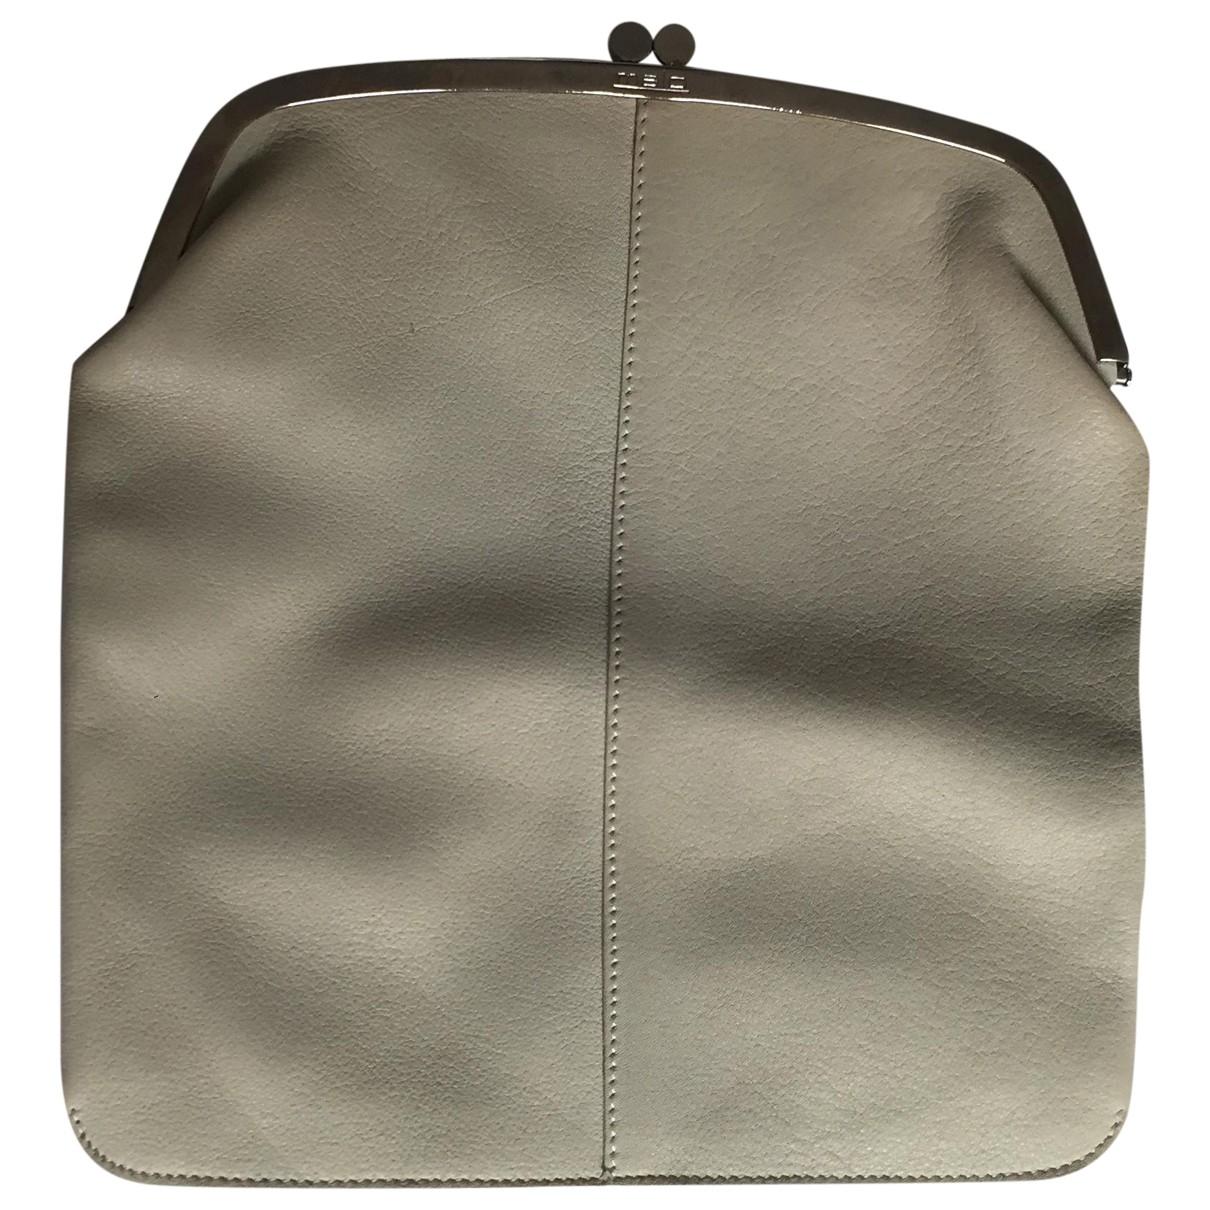 Malo \N Beige Leather Clutch bag for Women \N